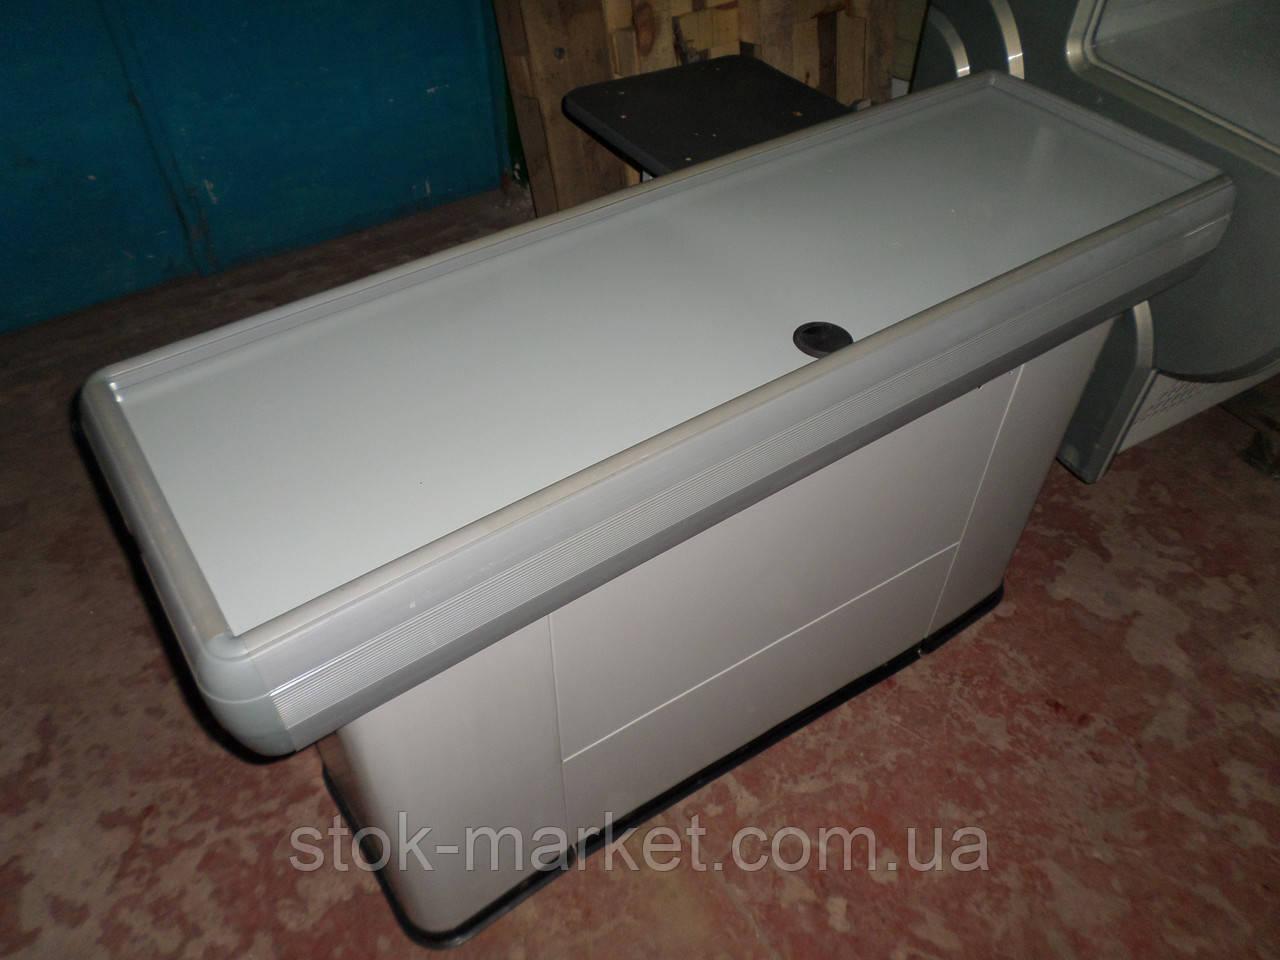 Кассовый бокс Кассовое место Modern-1,5 м (Mini) без транспортера.